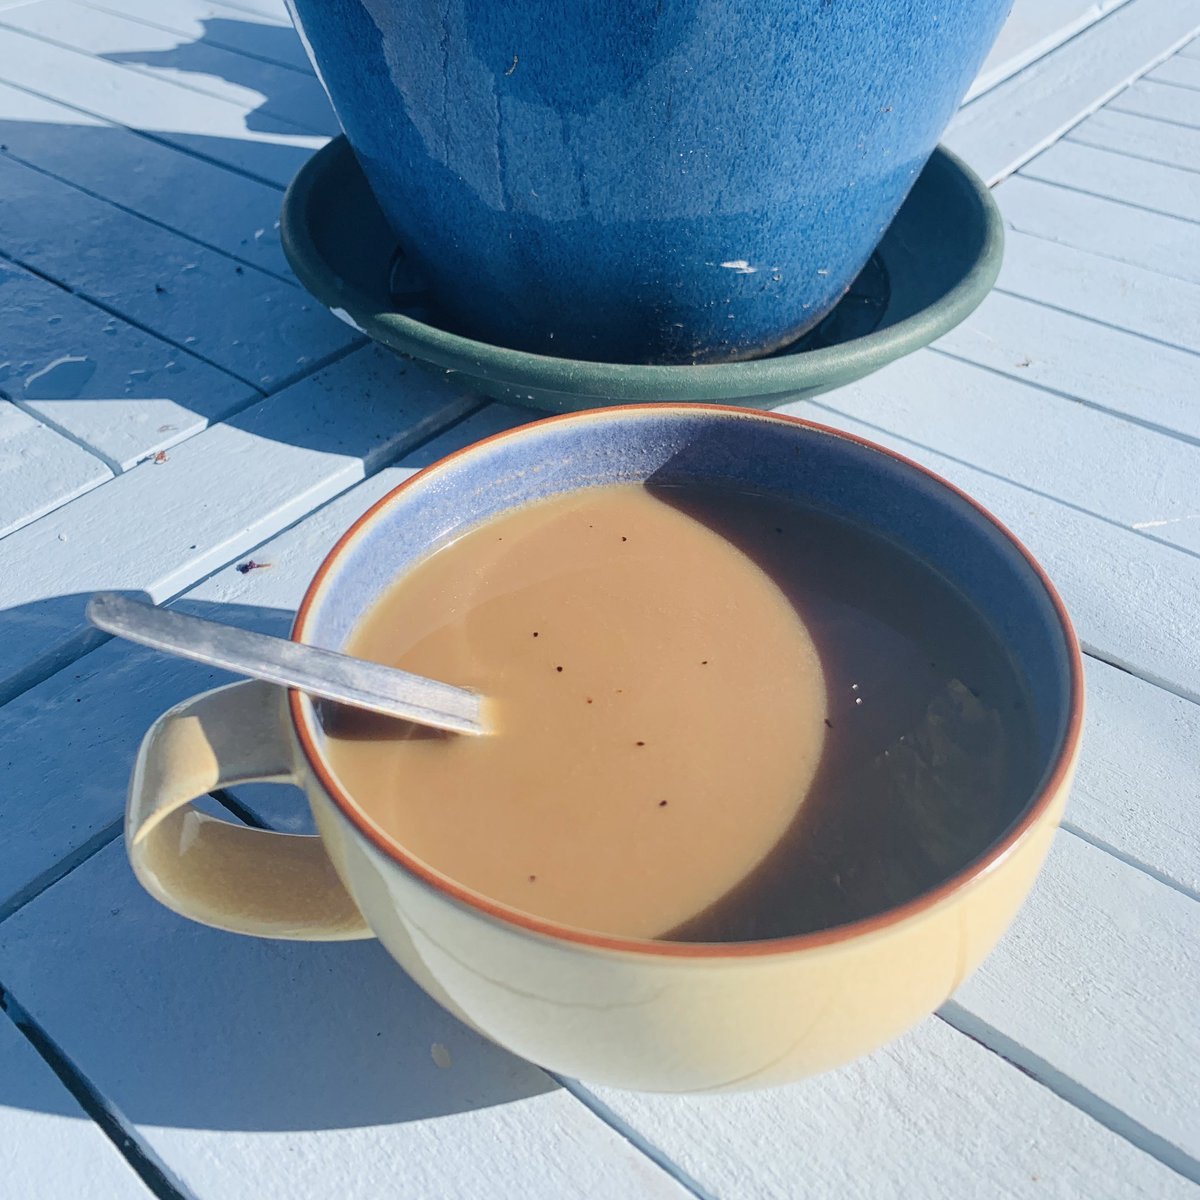 #MotivationalMonday #goodmorning #garden #birdsong #coffee #sun #FeelingGood